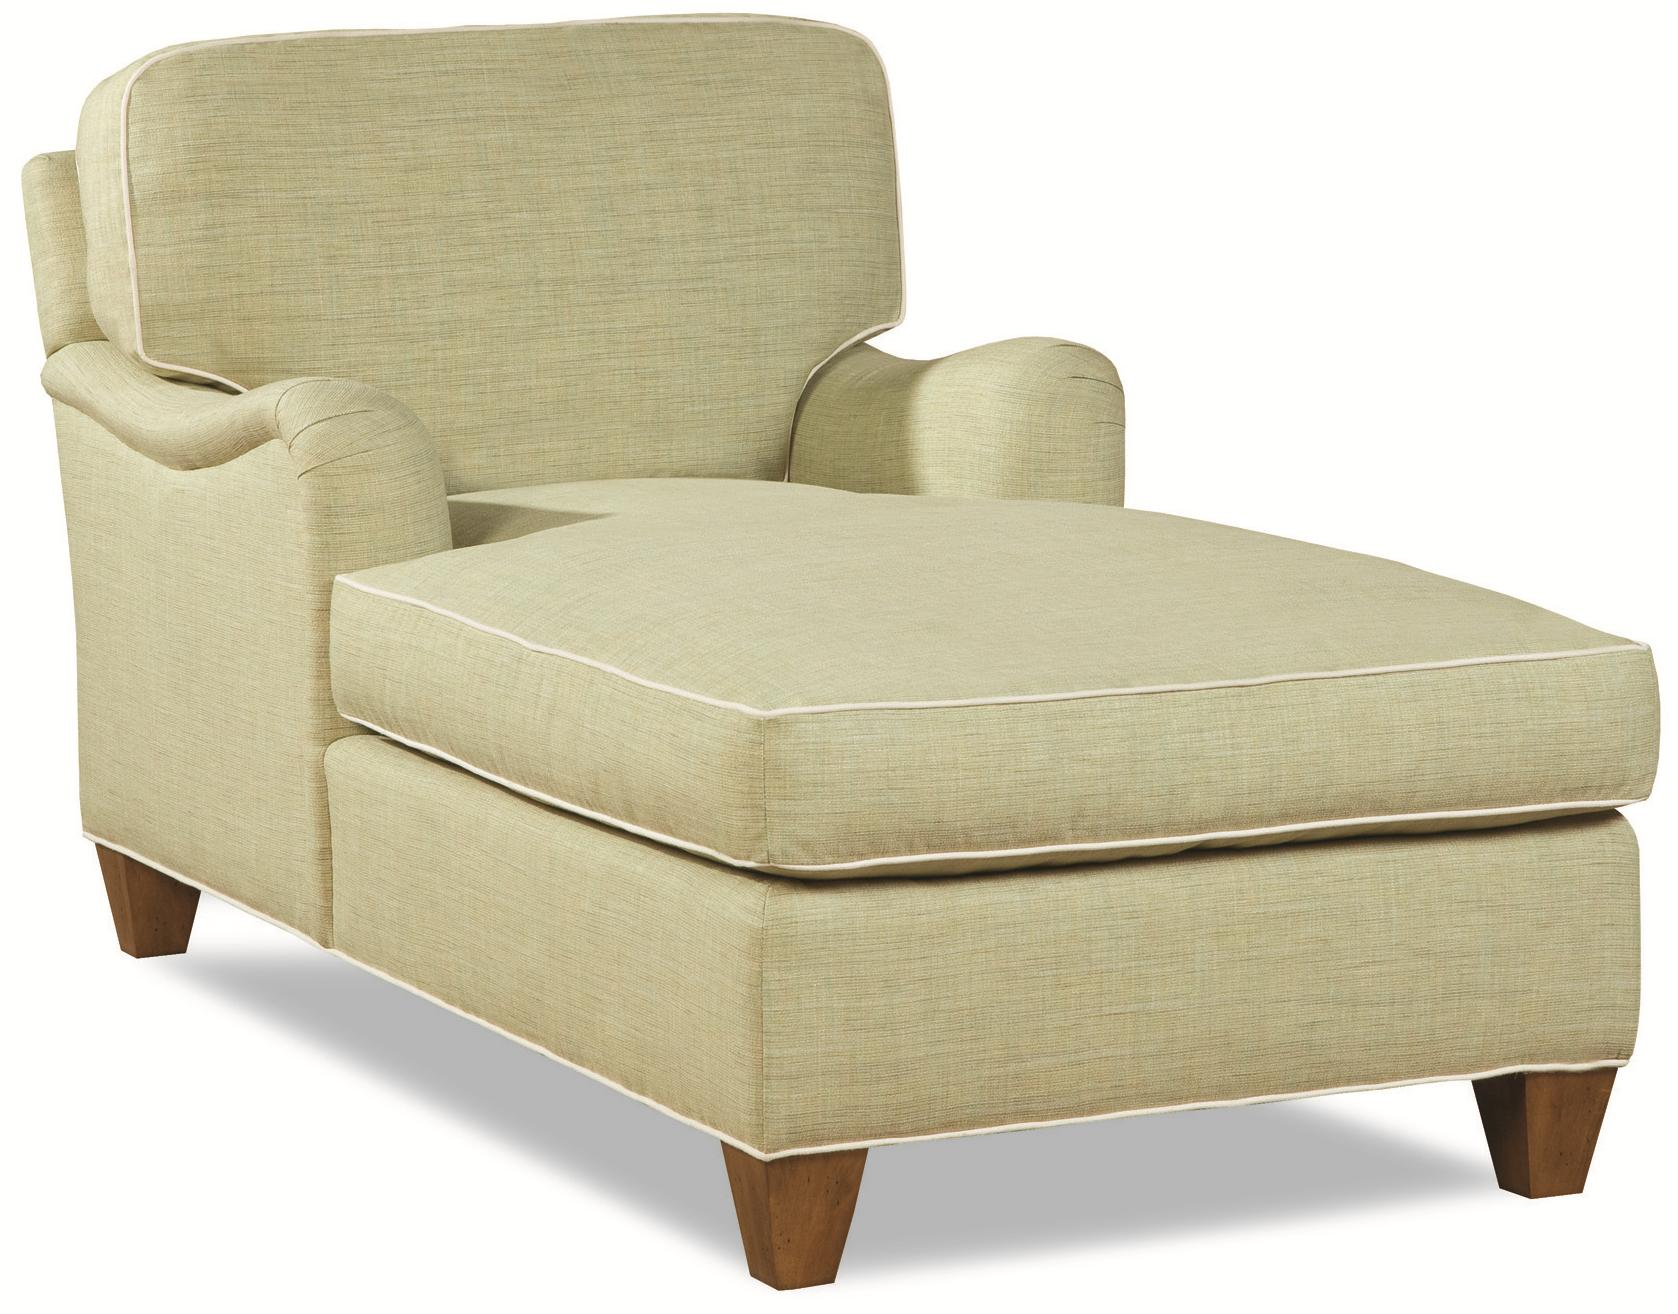 2041 Customizable Chaise by Geoffrey Alexander at Sprintz Furniture